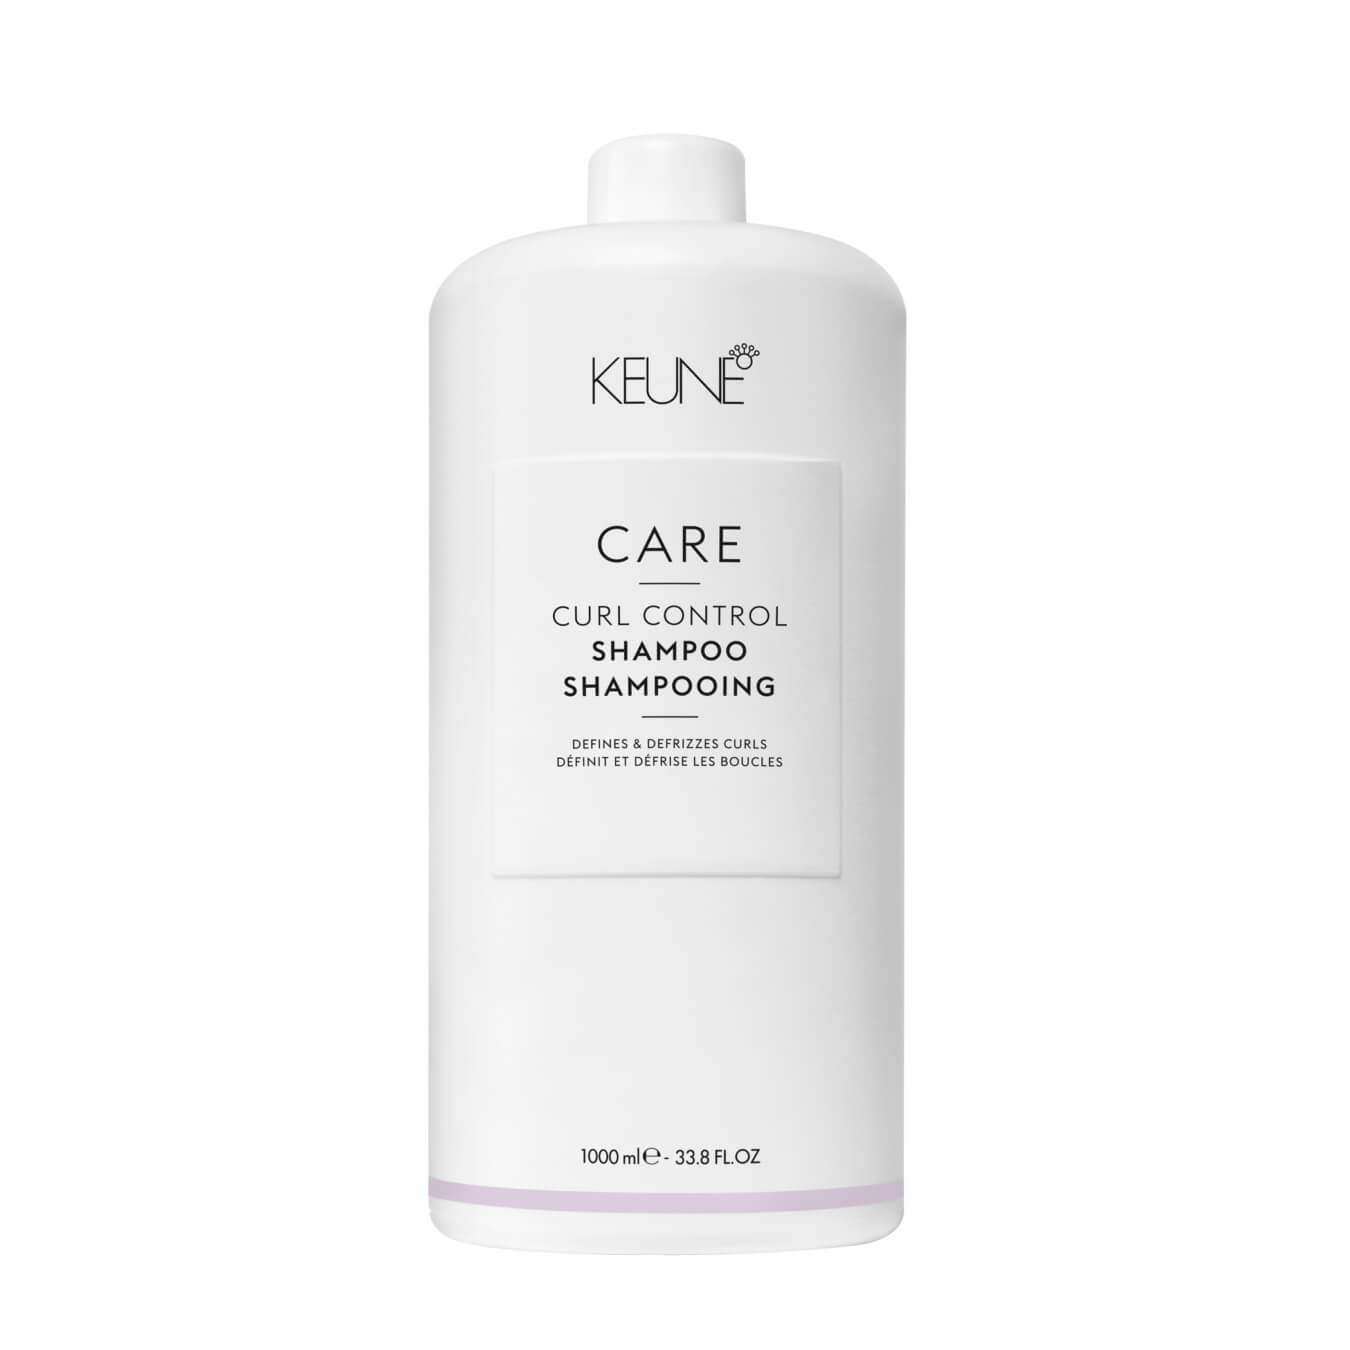 Koop Keune Care Curl Control Shampoo 1000ml